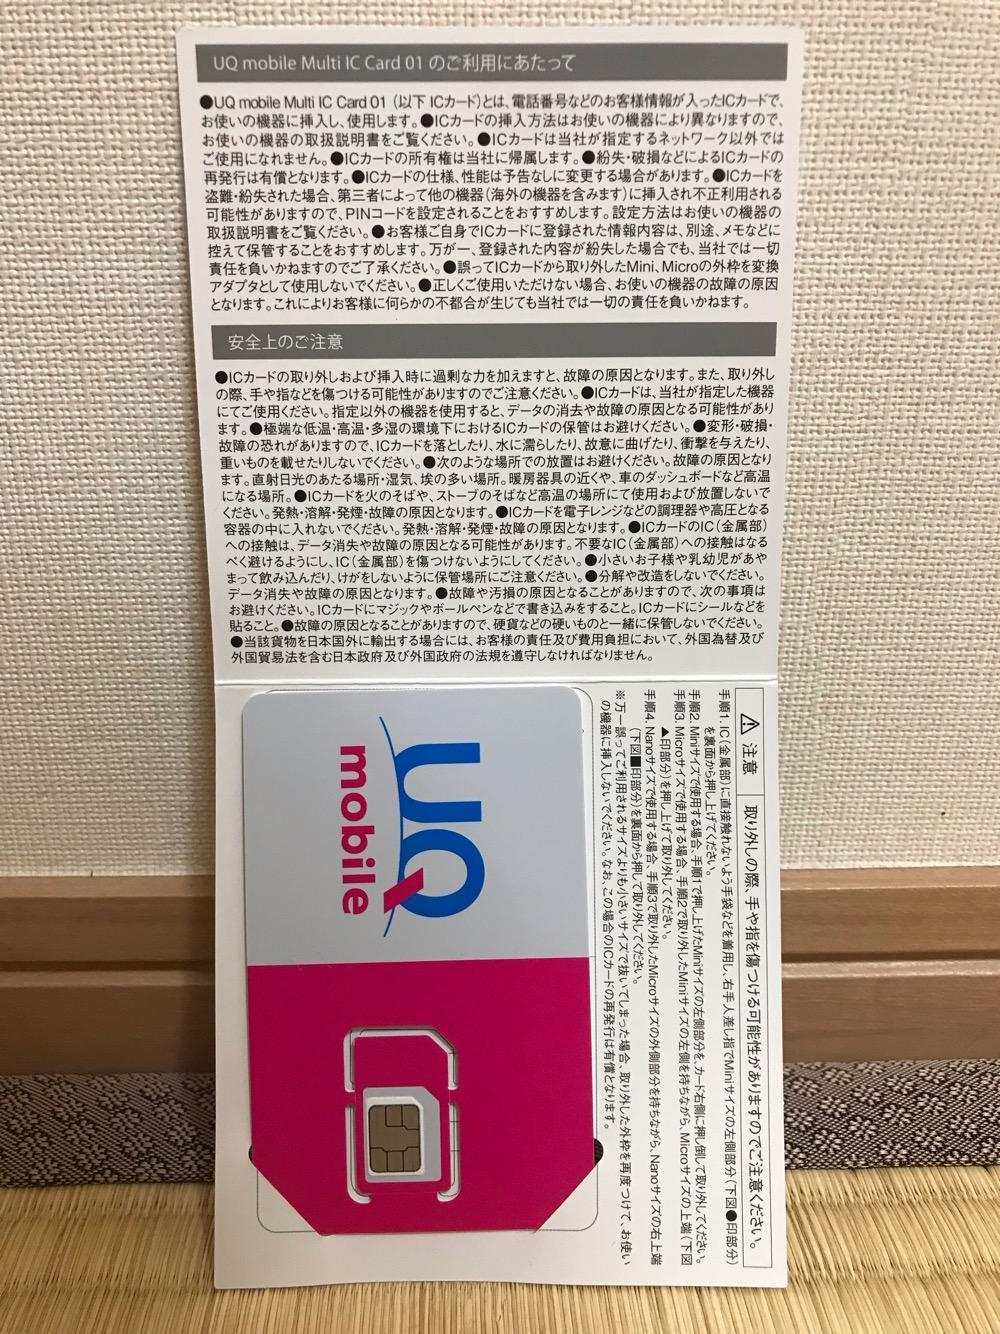 UQ mobile Multi IC Card 01 取扱説明書とSIMカード本体